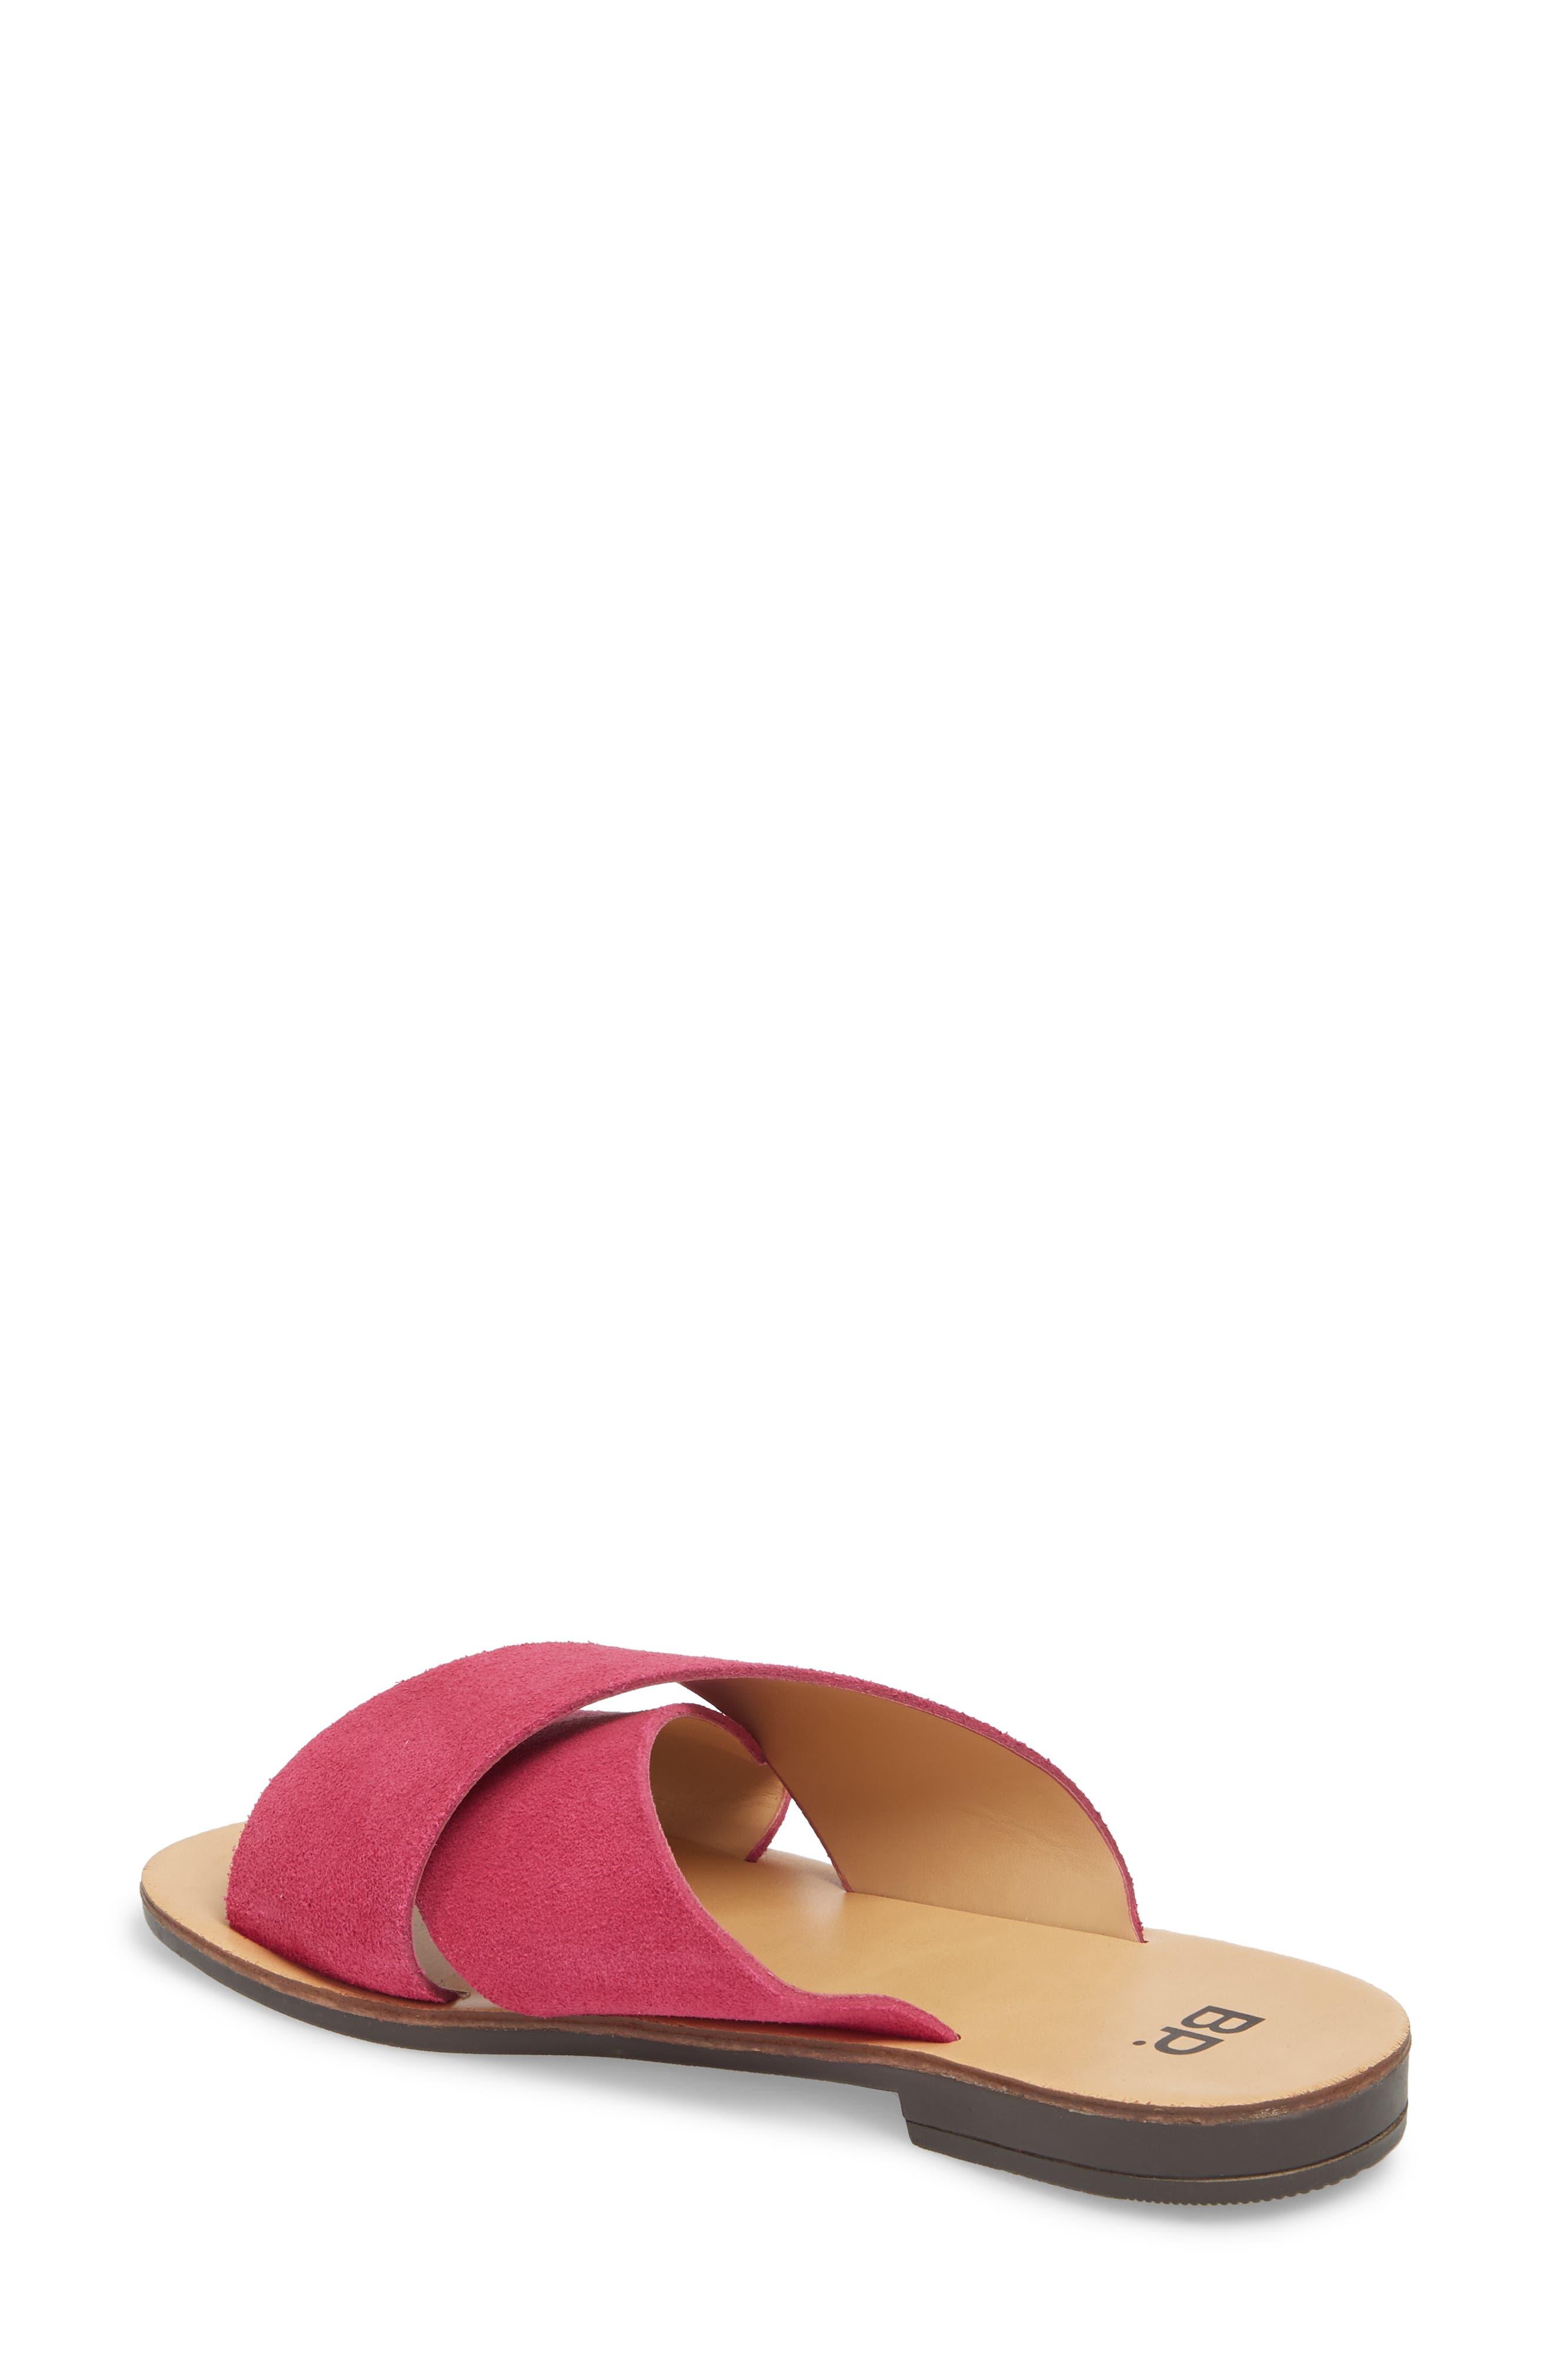 Twist Cross Strap Sandal,                             Alternate thumbnail 18, color,